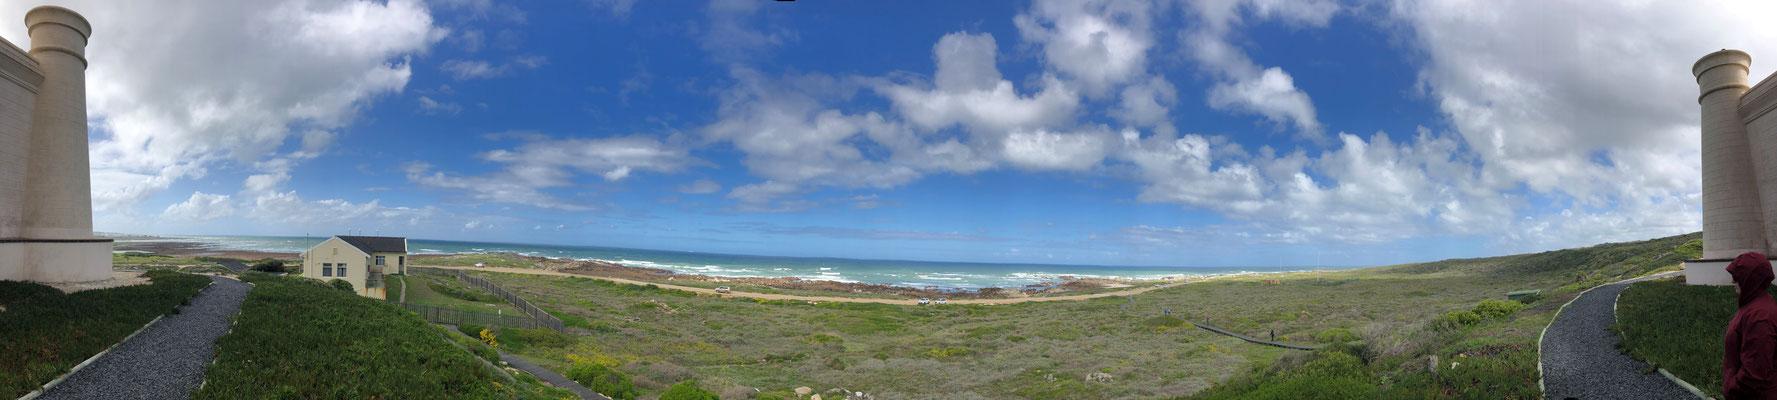 Panoramasicht vor dem Leuchtturm Cape Agulhas